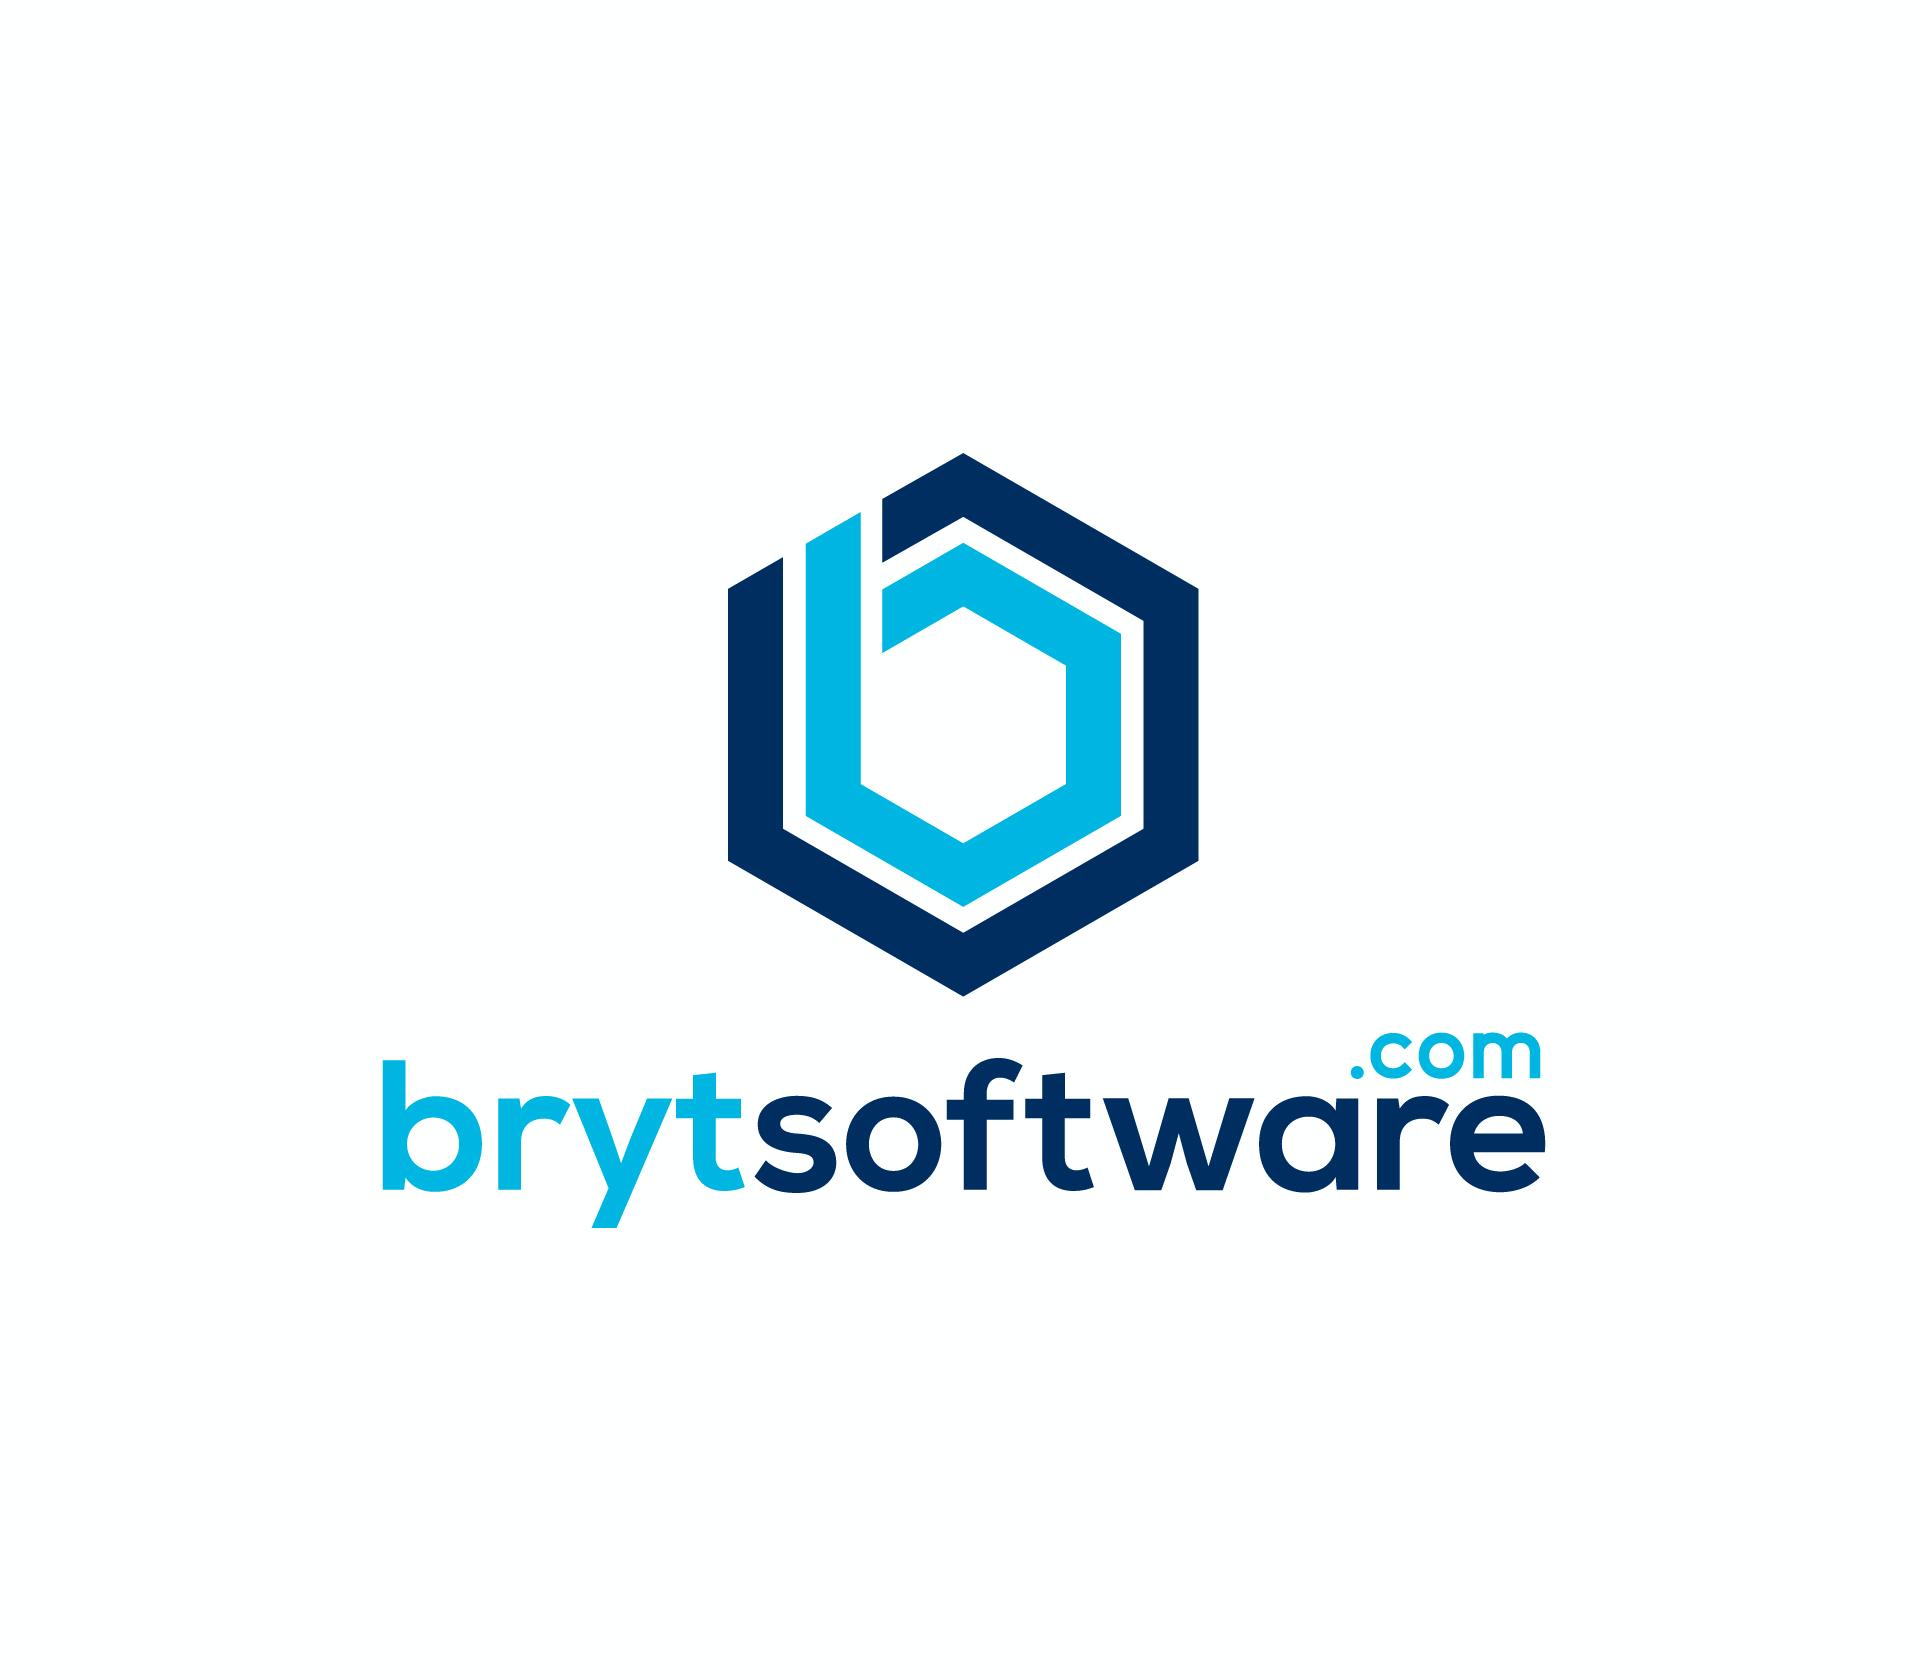 Bryt logo